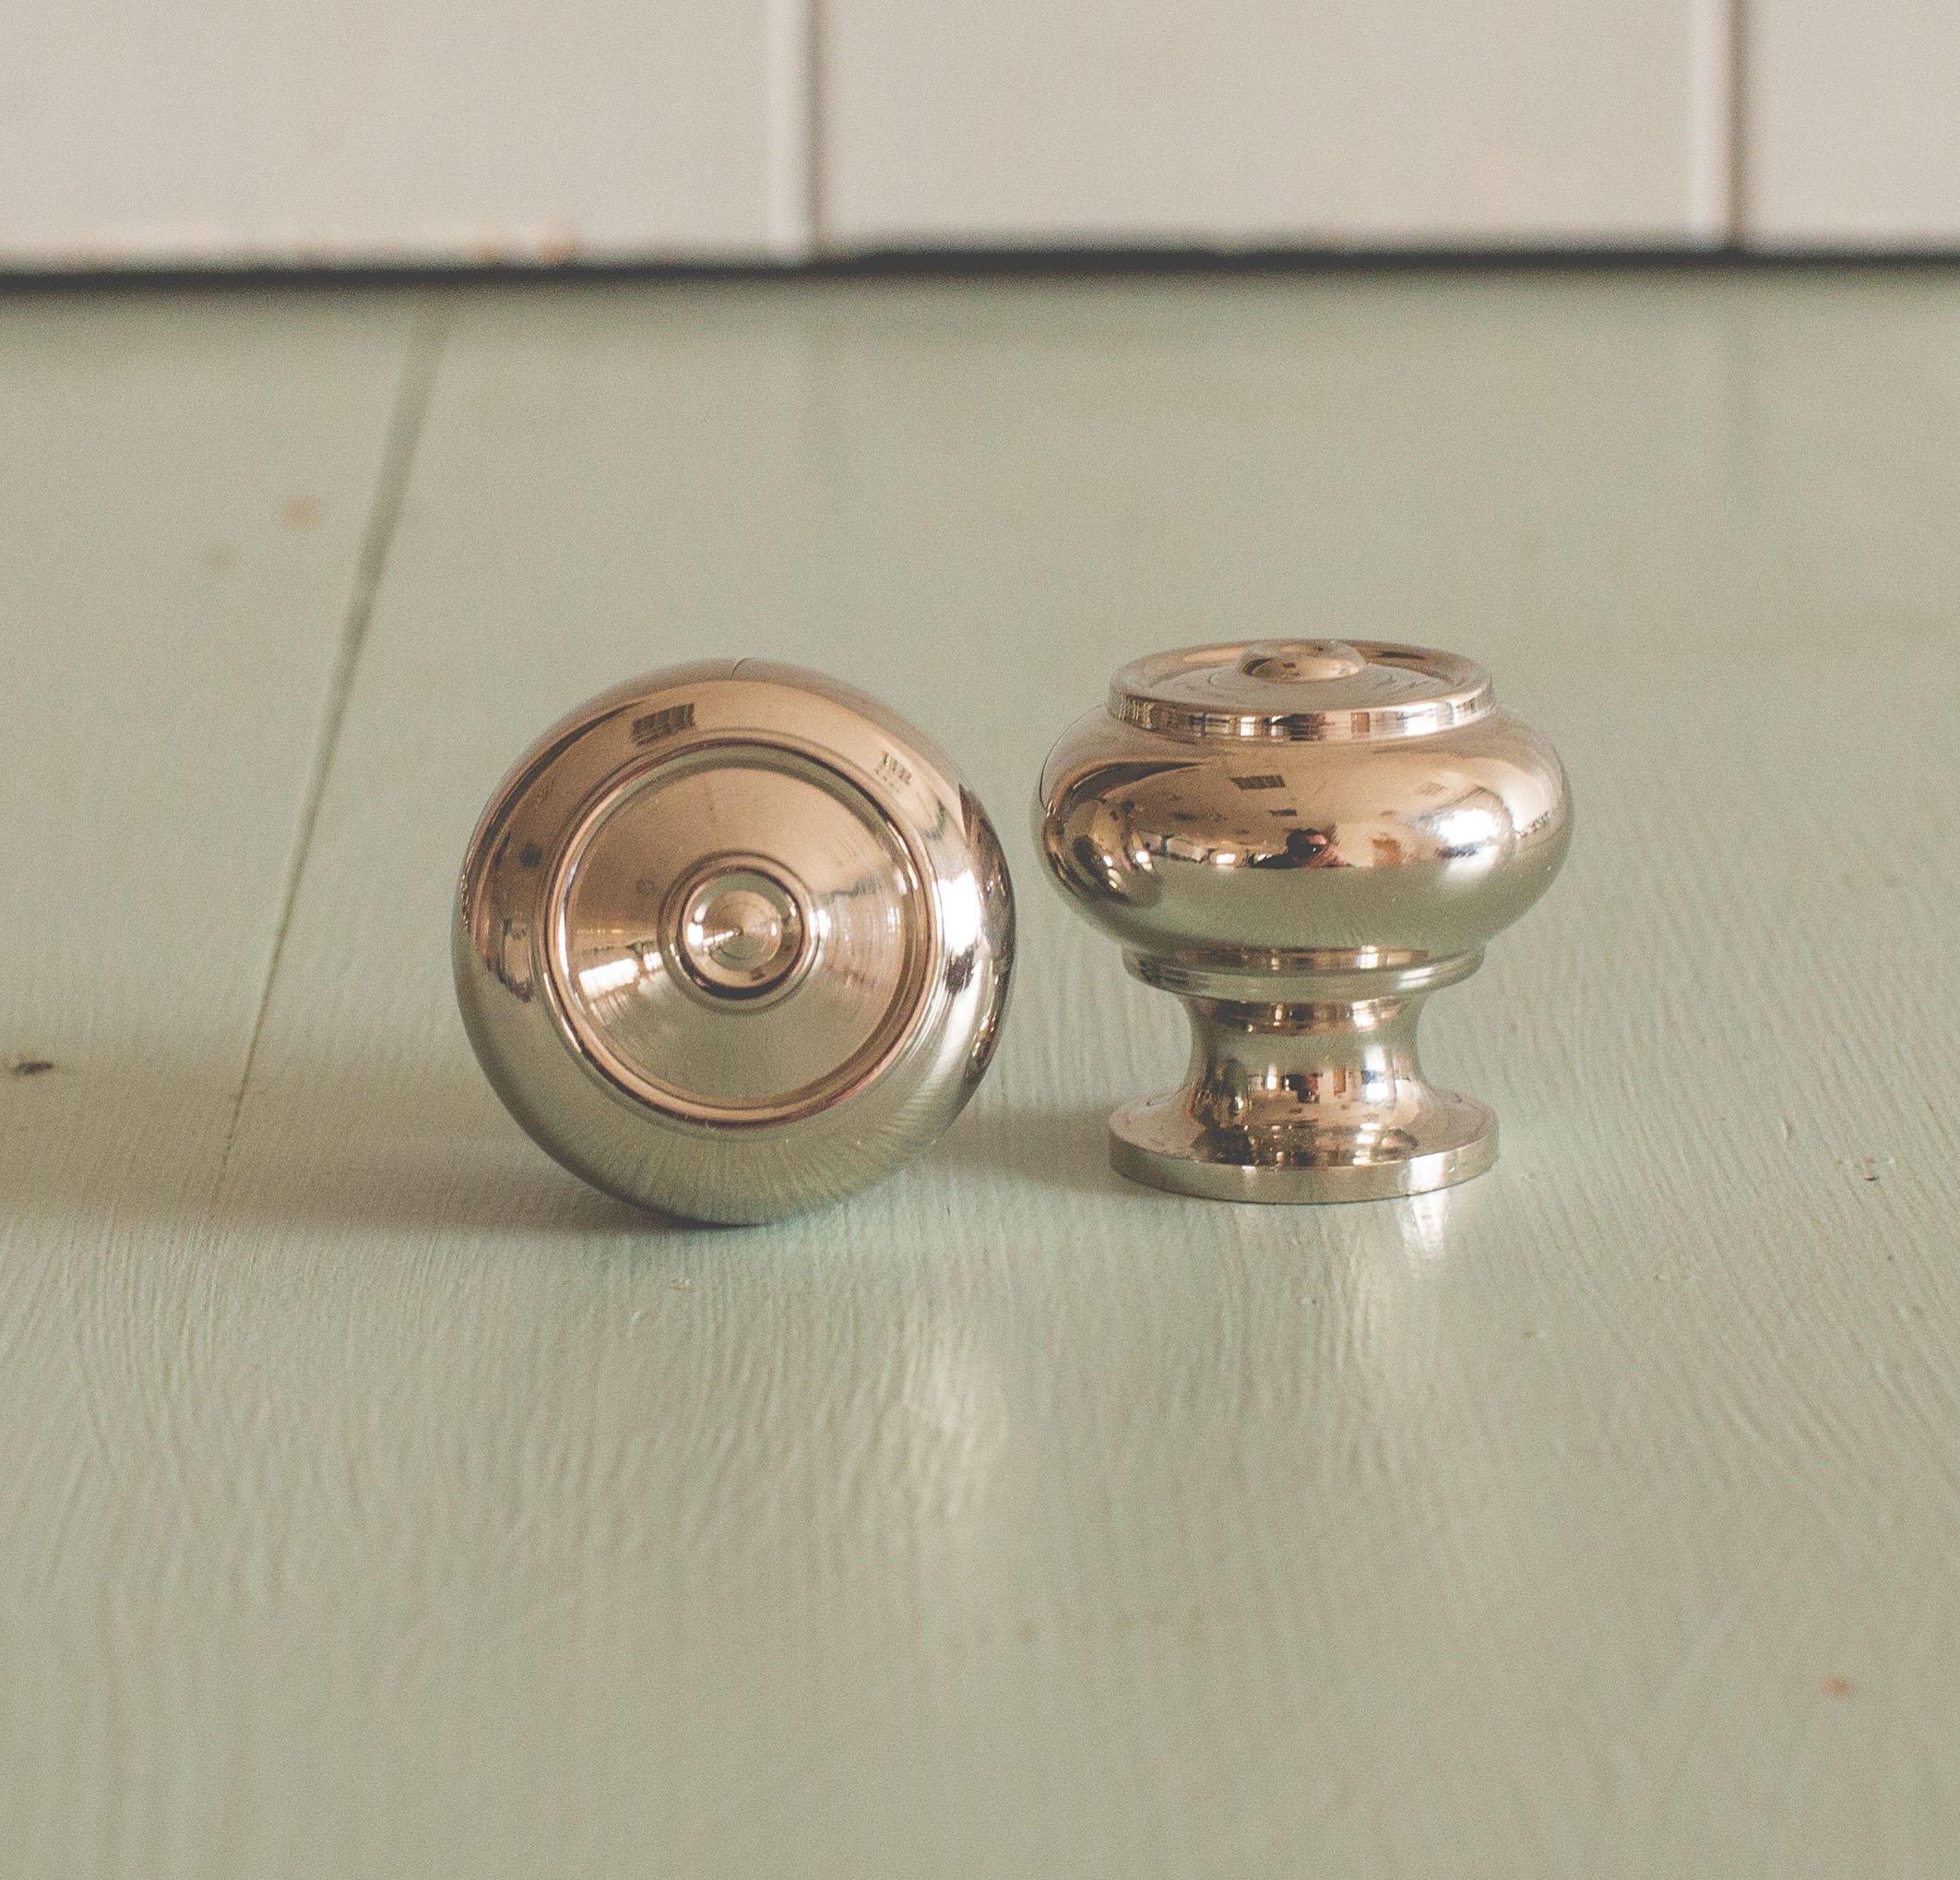 Regency-Style Small Cabinet Knob - Nickel